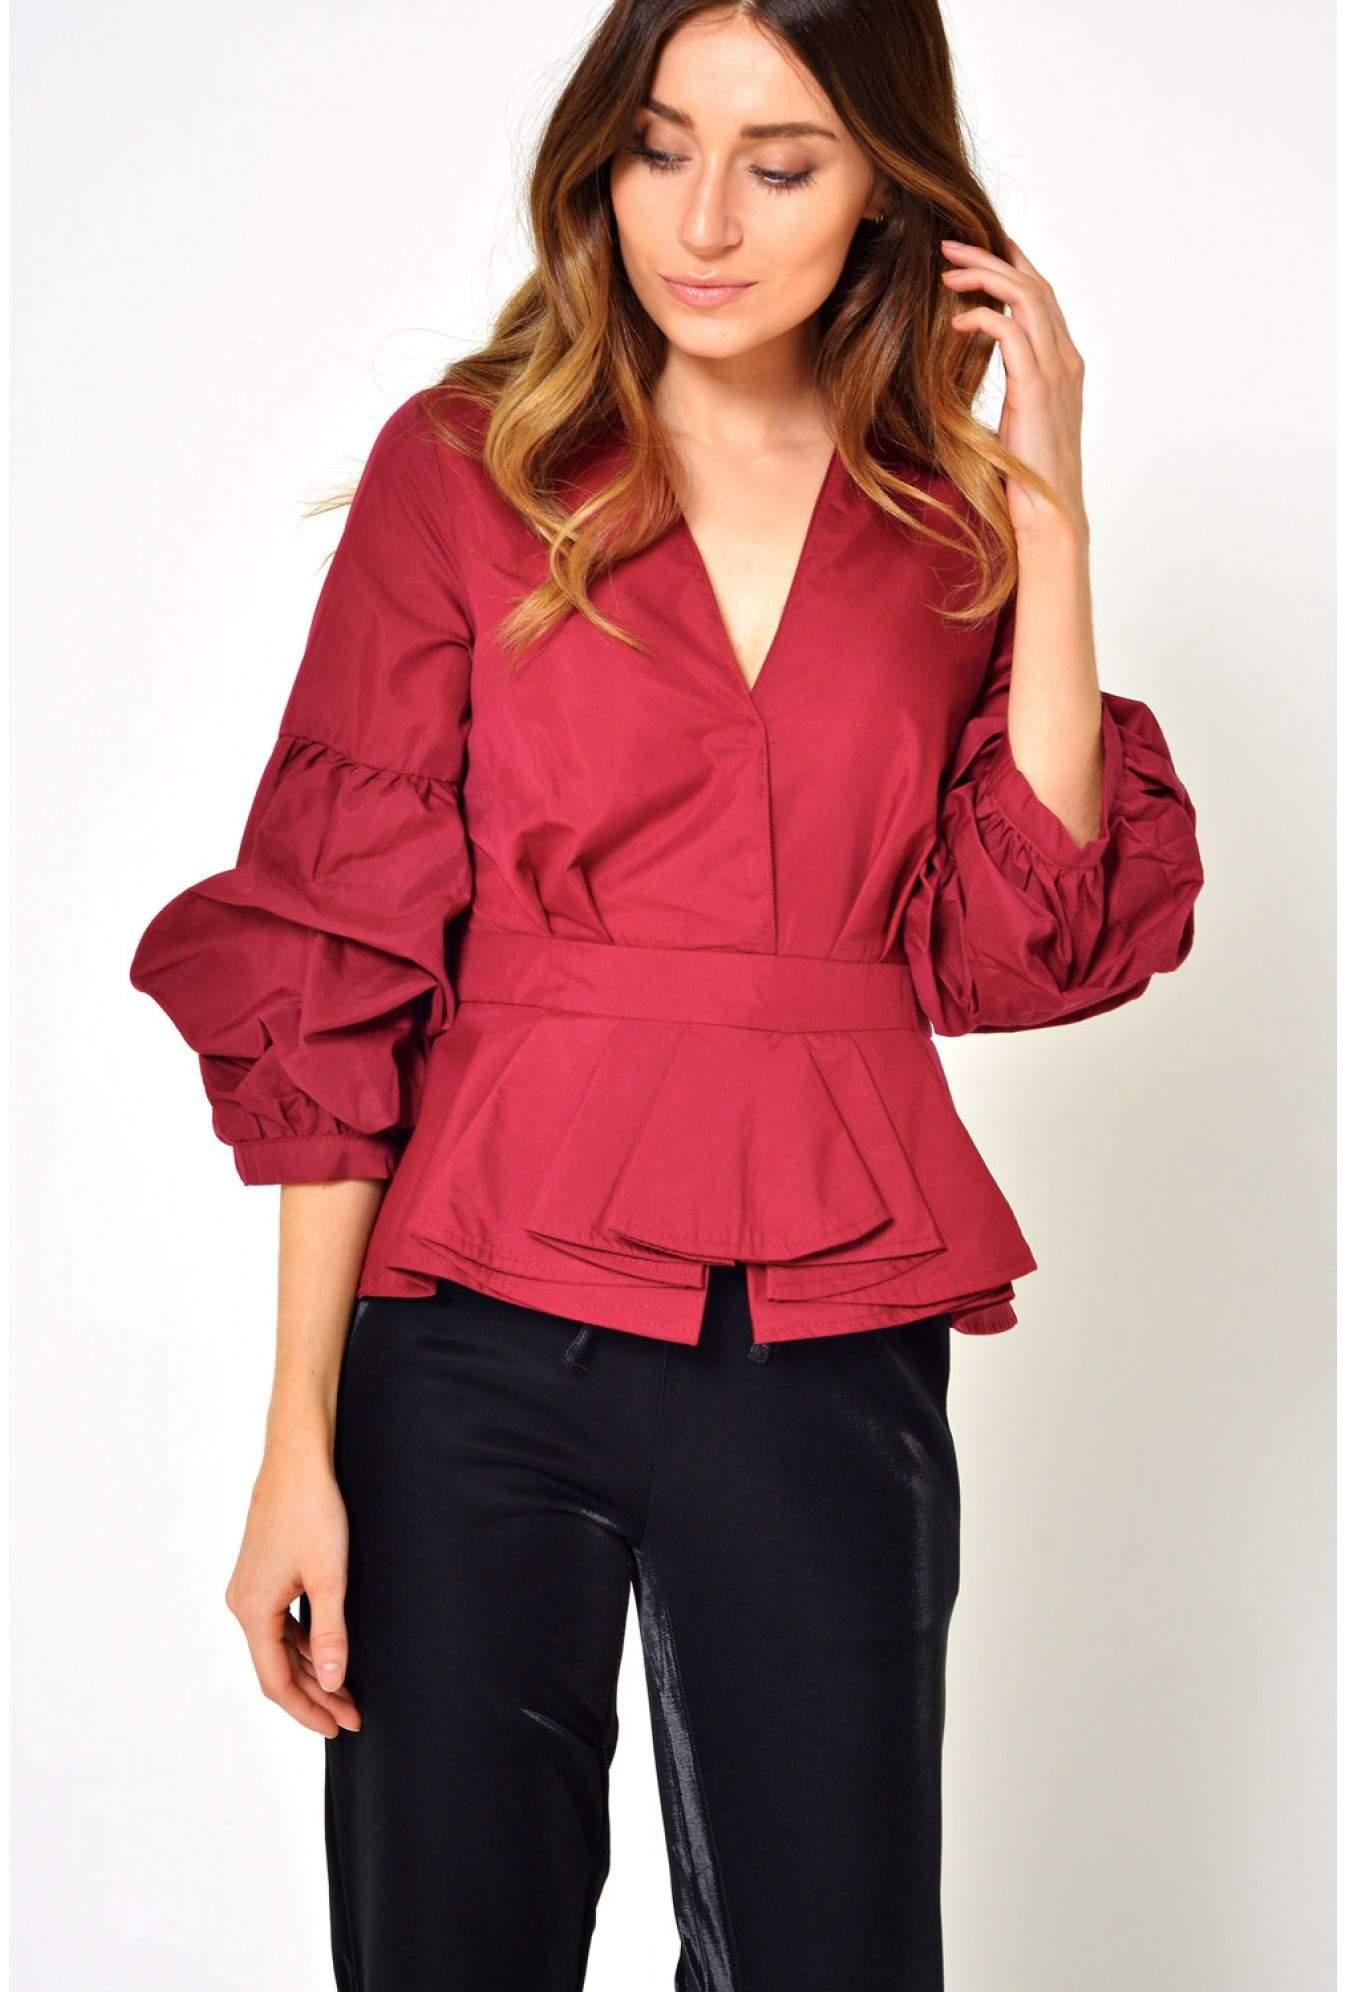 bca01a1a82355c Lucy Wang Lizzy Puff Sleeve Peplum Shirt in Wine